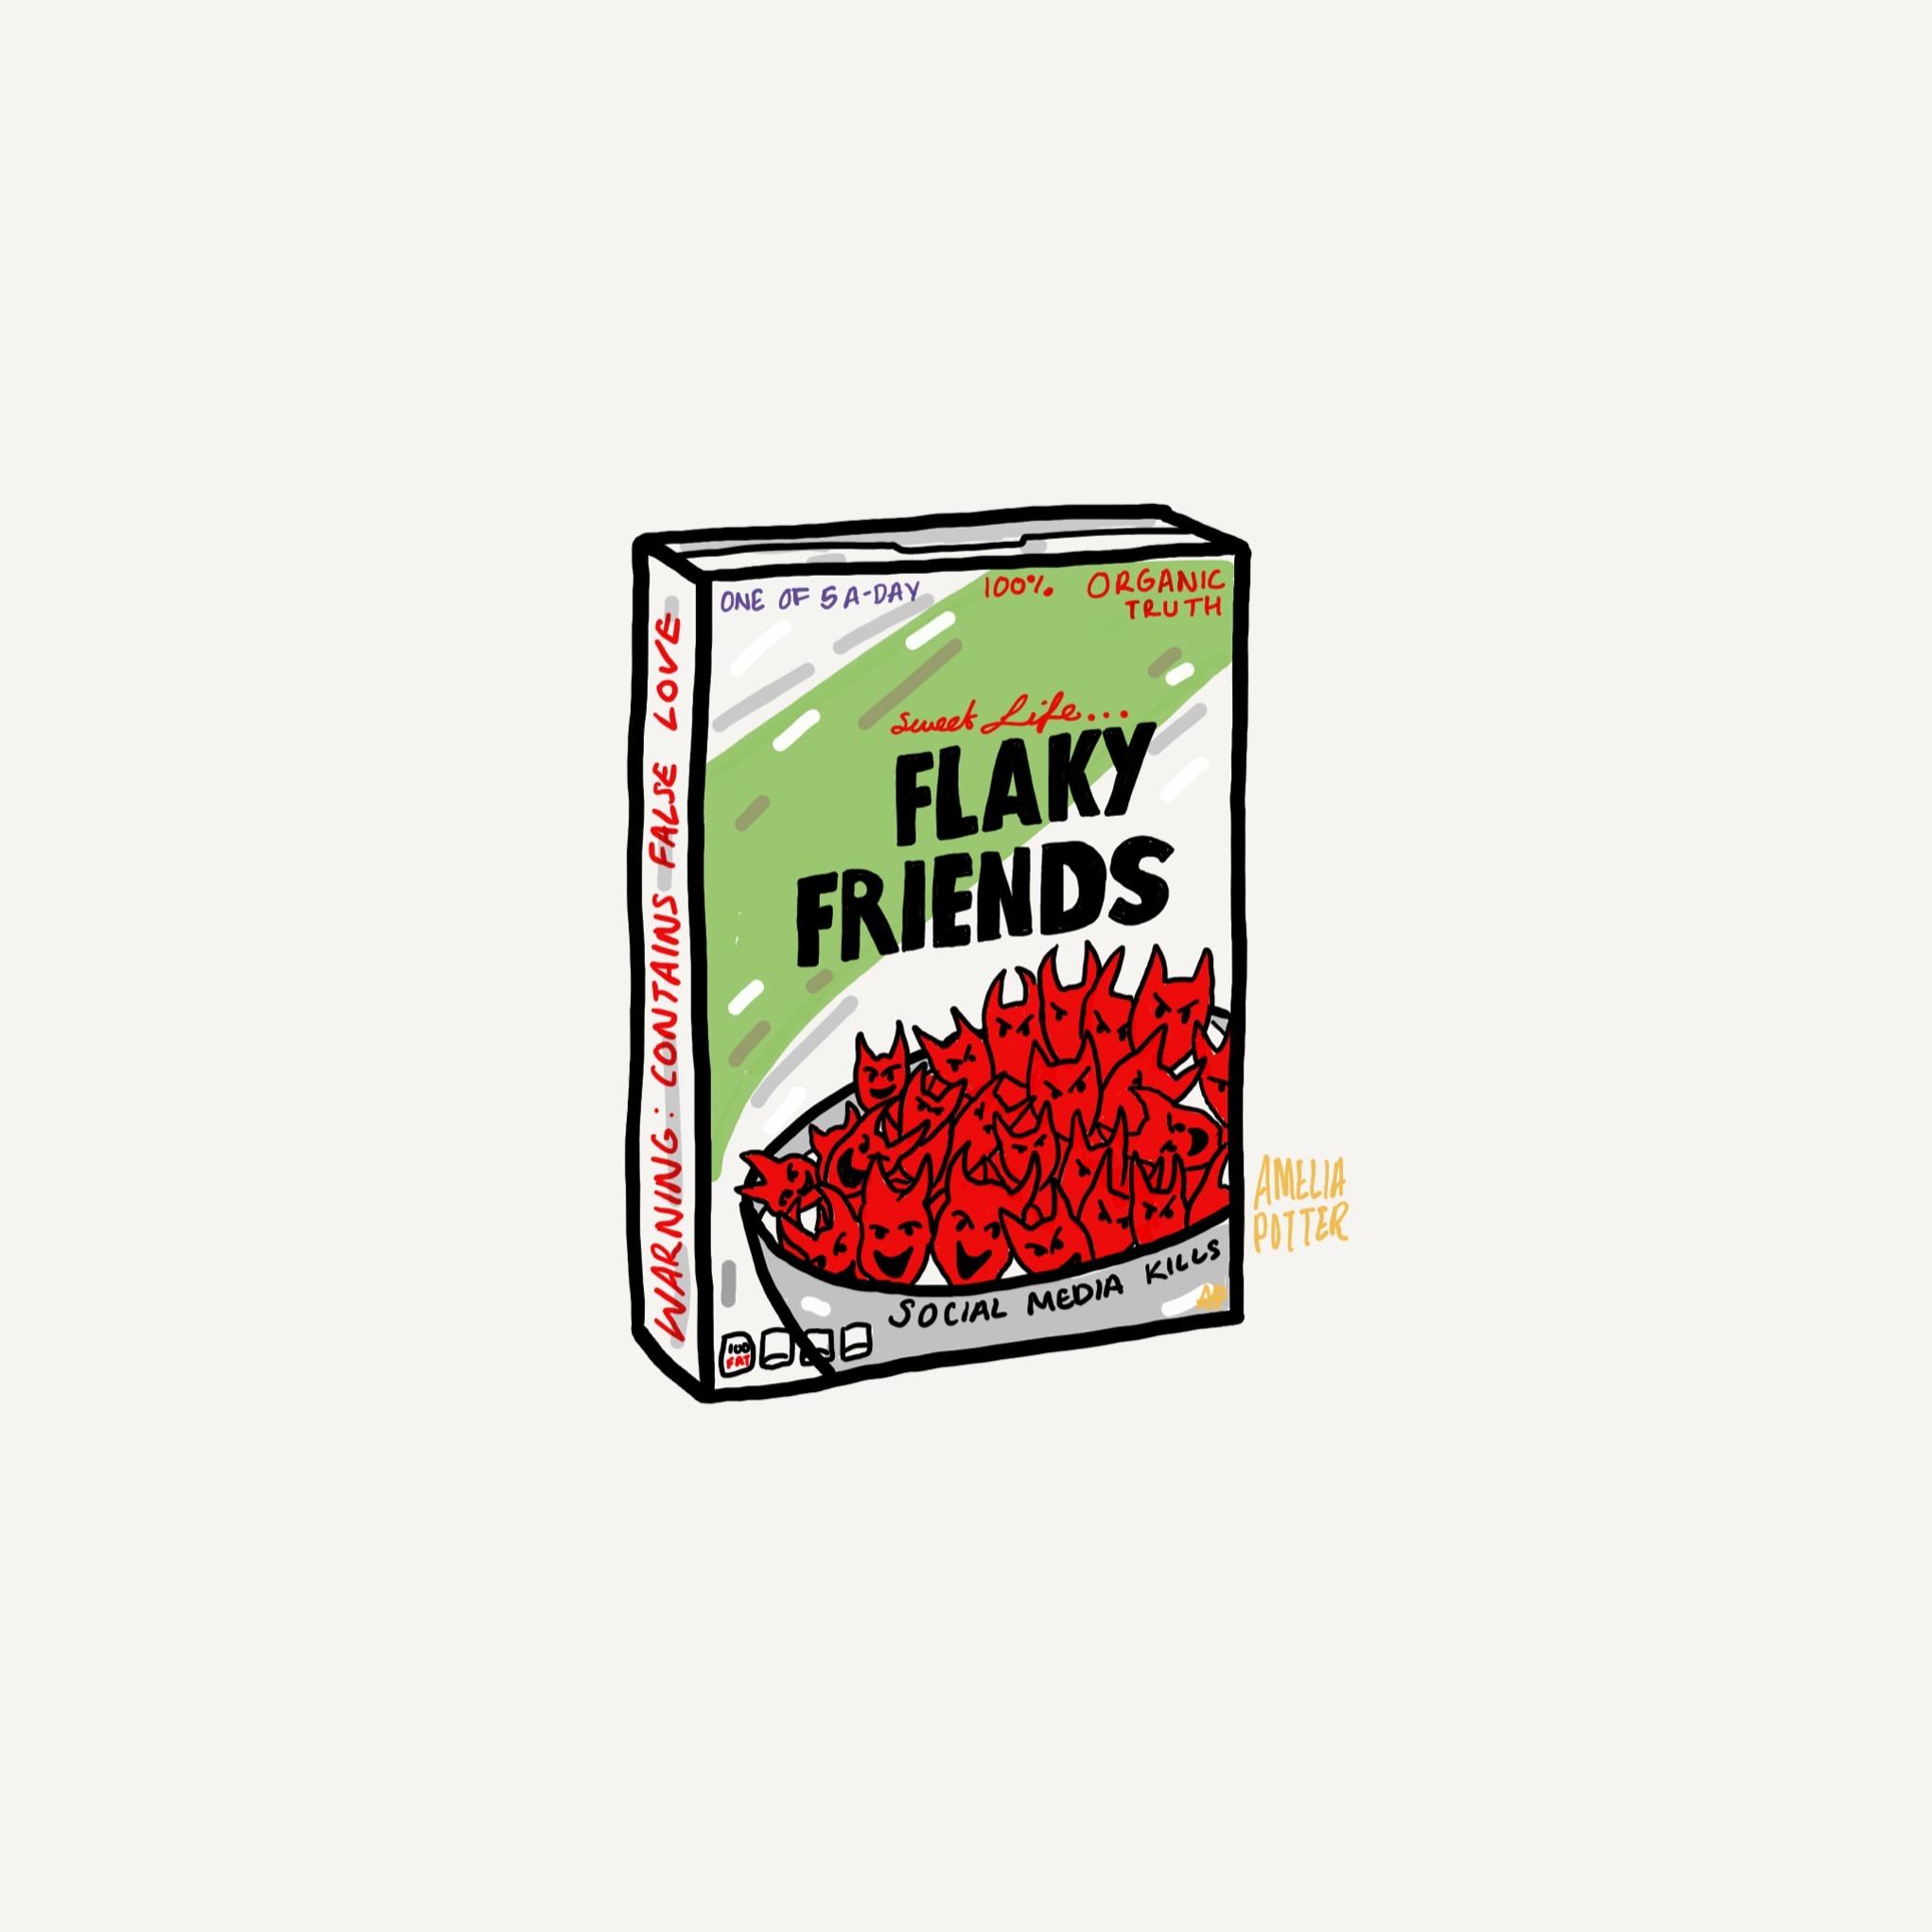 FLAKY FRIENDS CERIAL KILLER